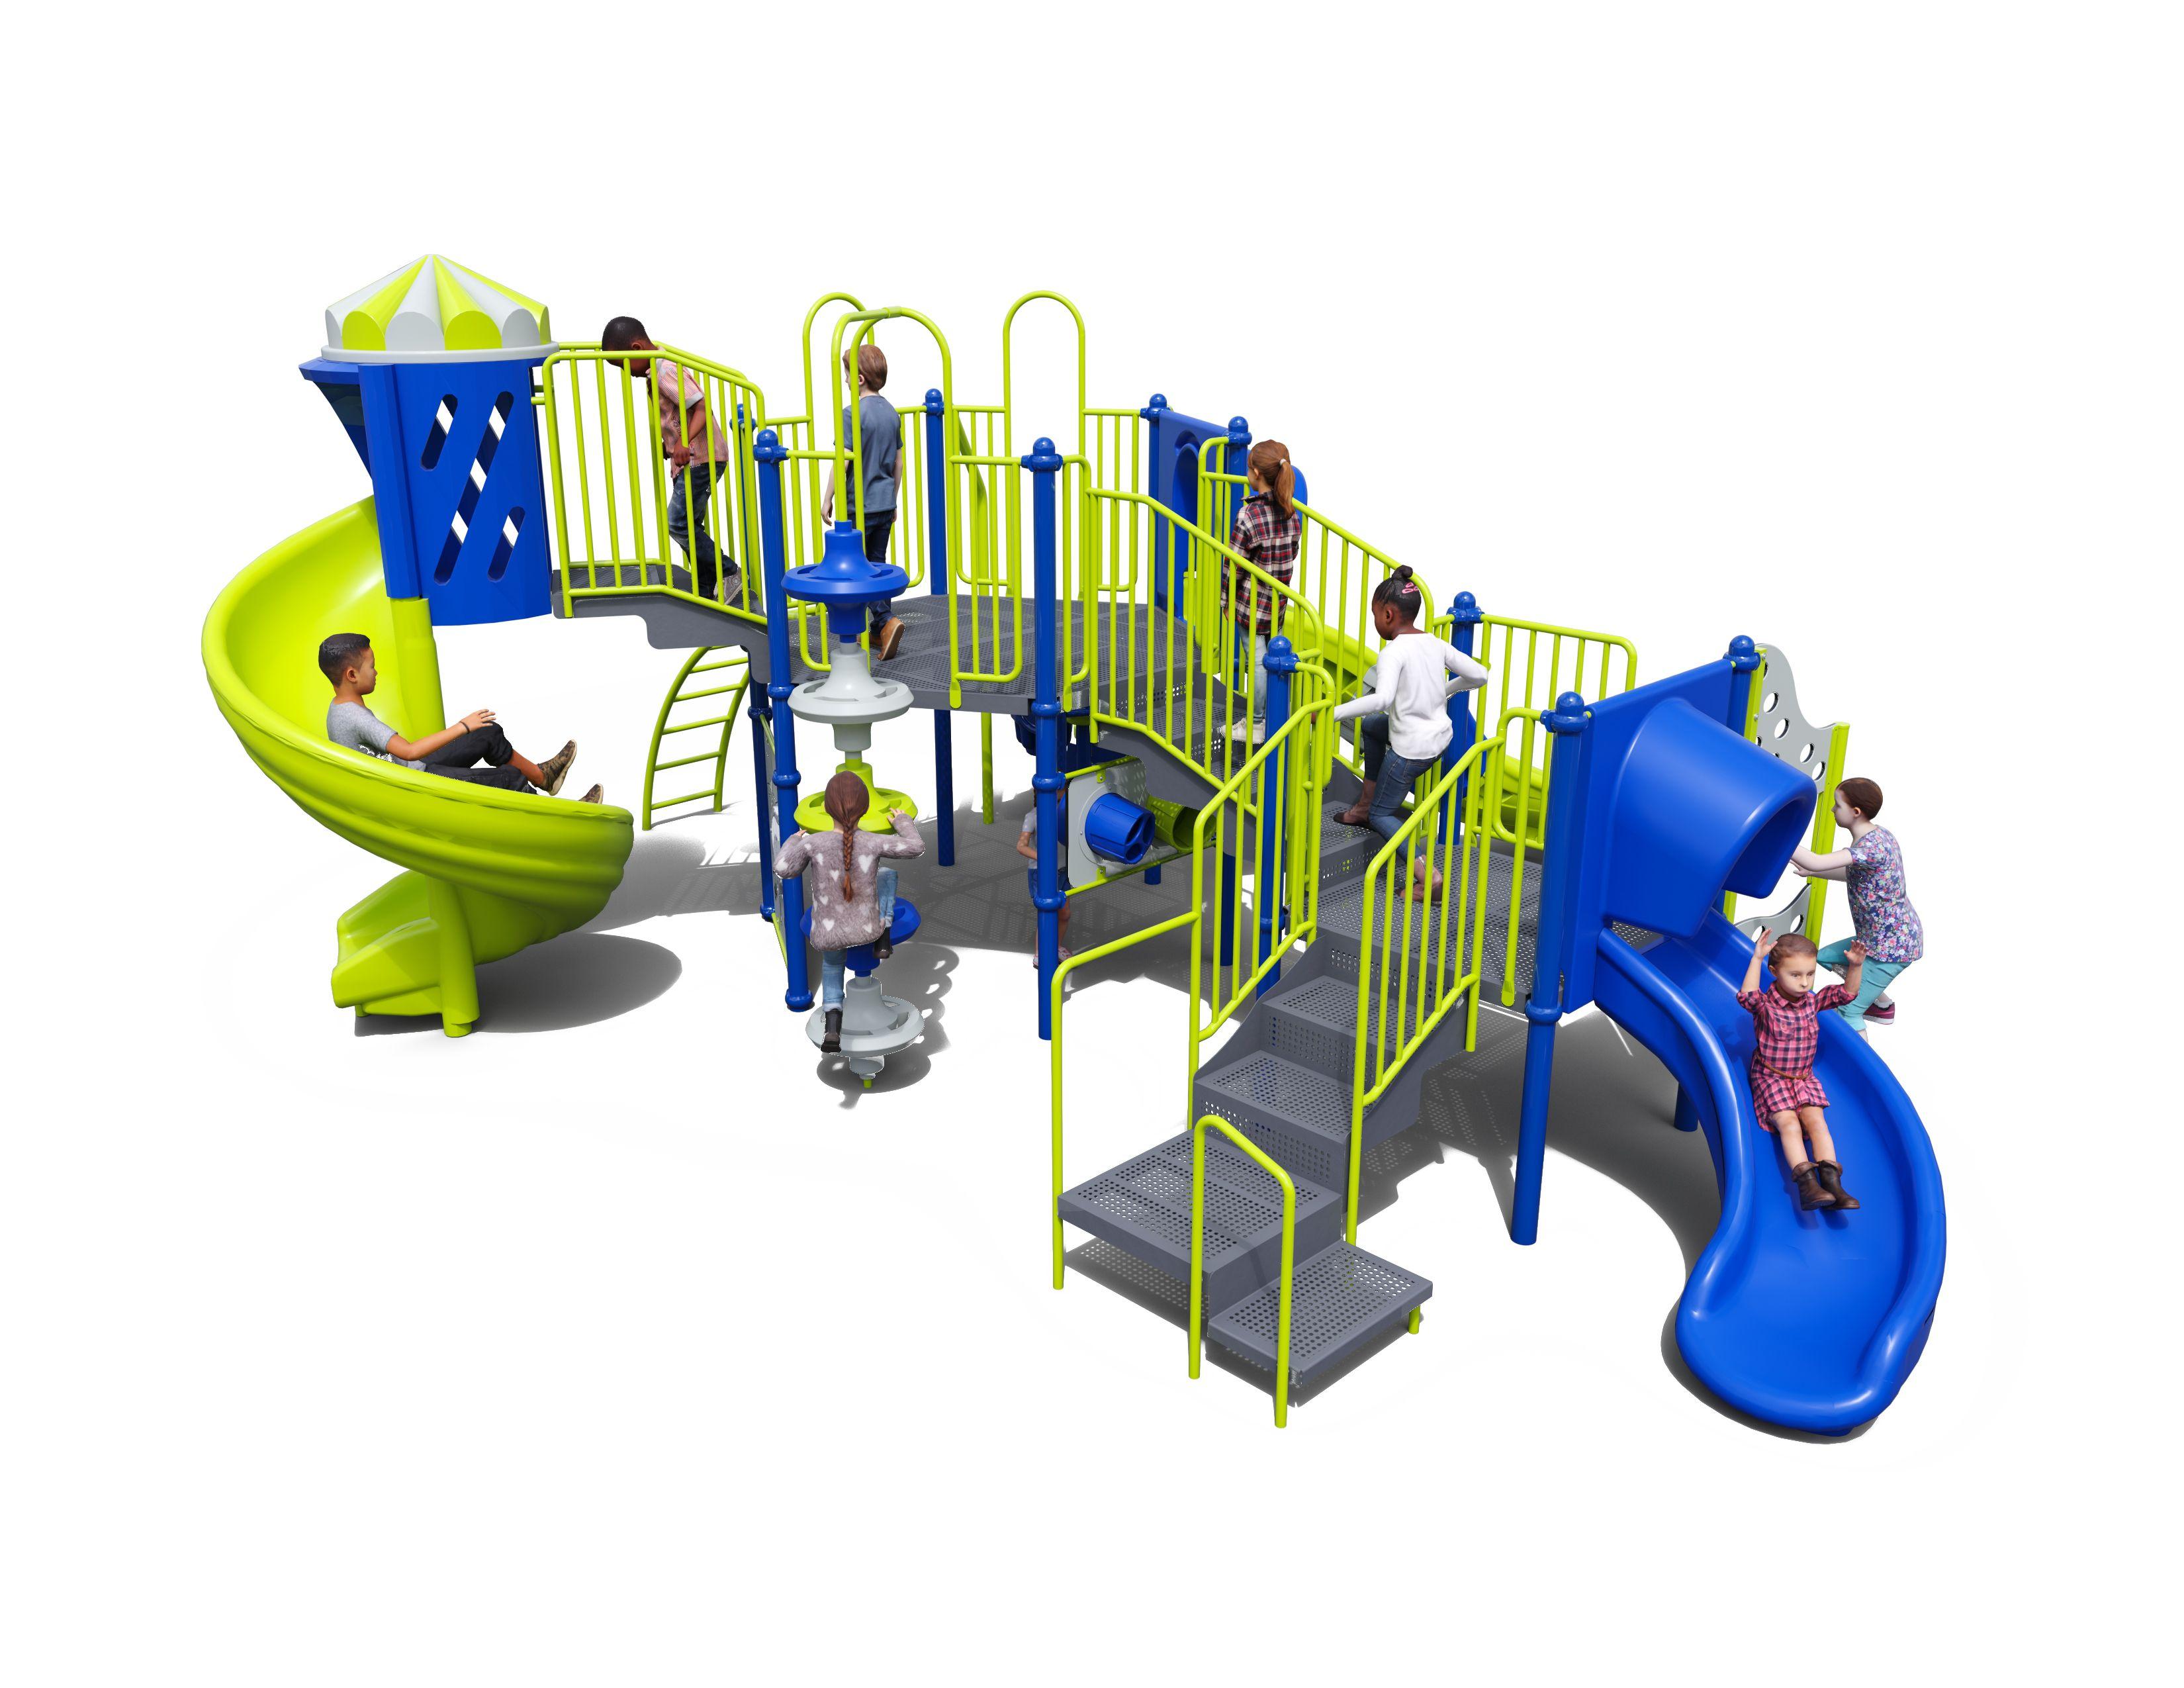 Tots' Choice Expansion Structure